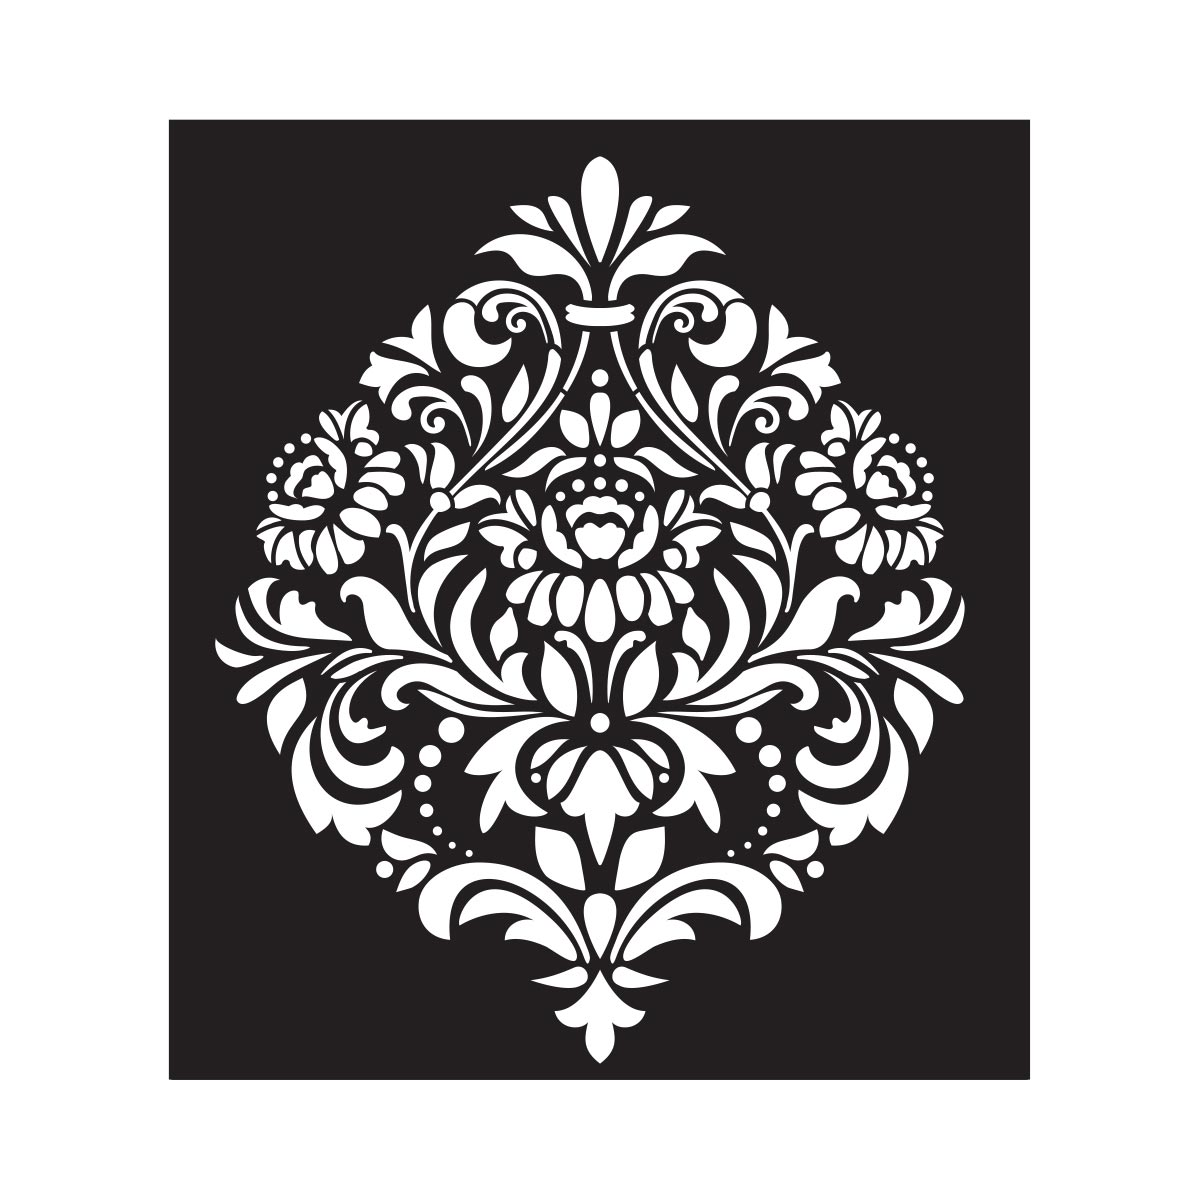 FolkArt ® Painting Stencils - Large - Damask 2 - 13214